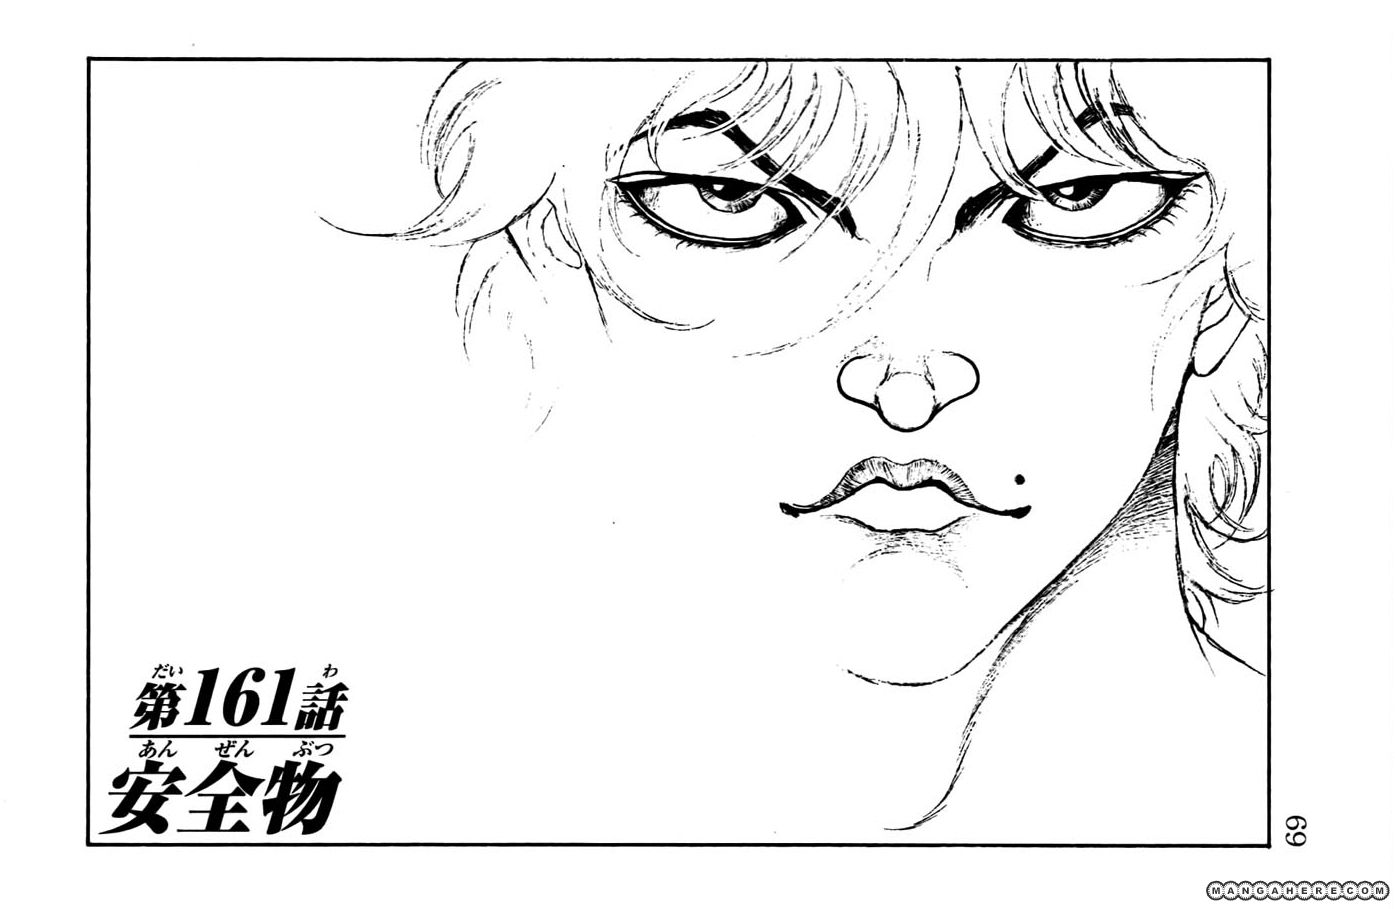 Baki - Son Of Ogre 161 Page 2